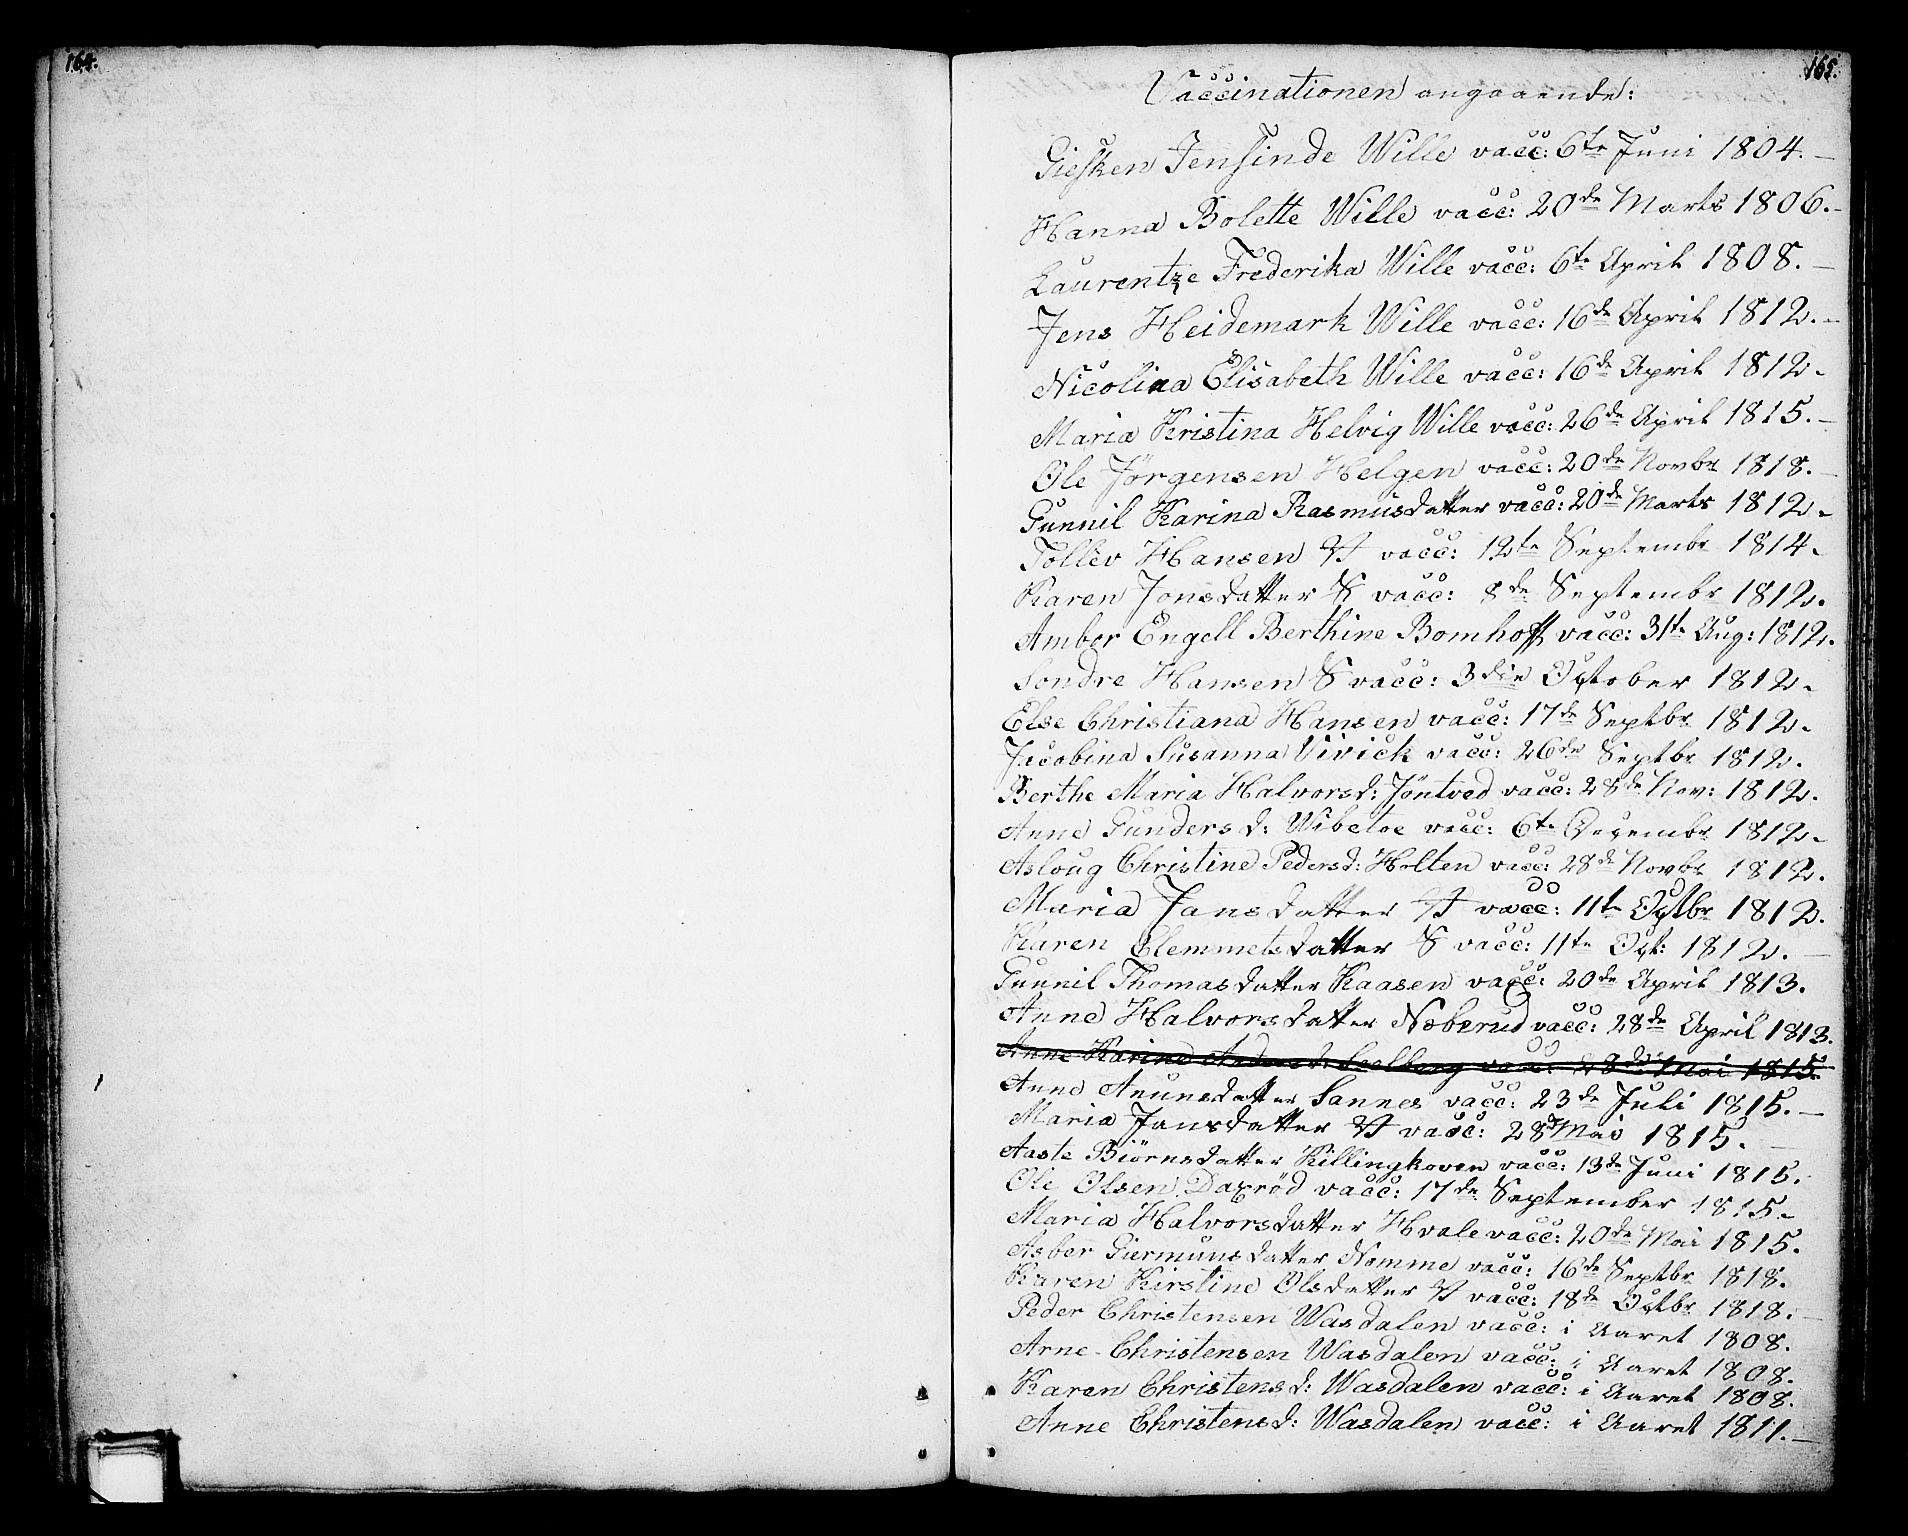 SAKO, Holla kirkebøker, F/Fa/L0002: Ministerialbok nr. 2, 1779-1814, s. 164-165